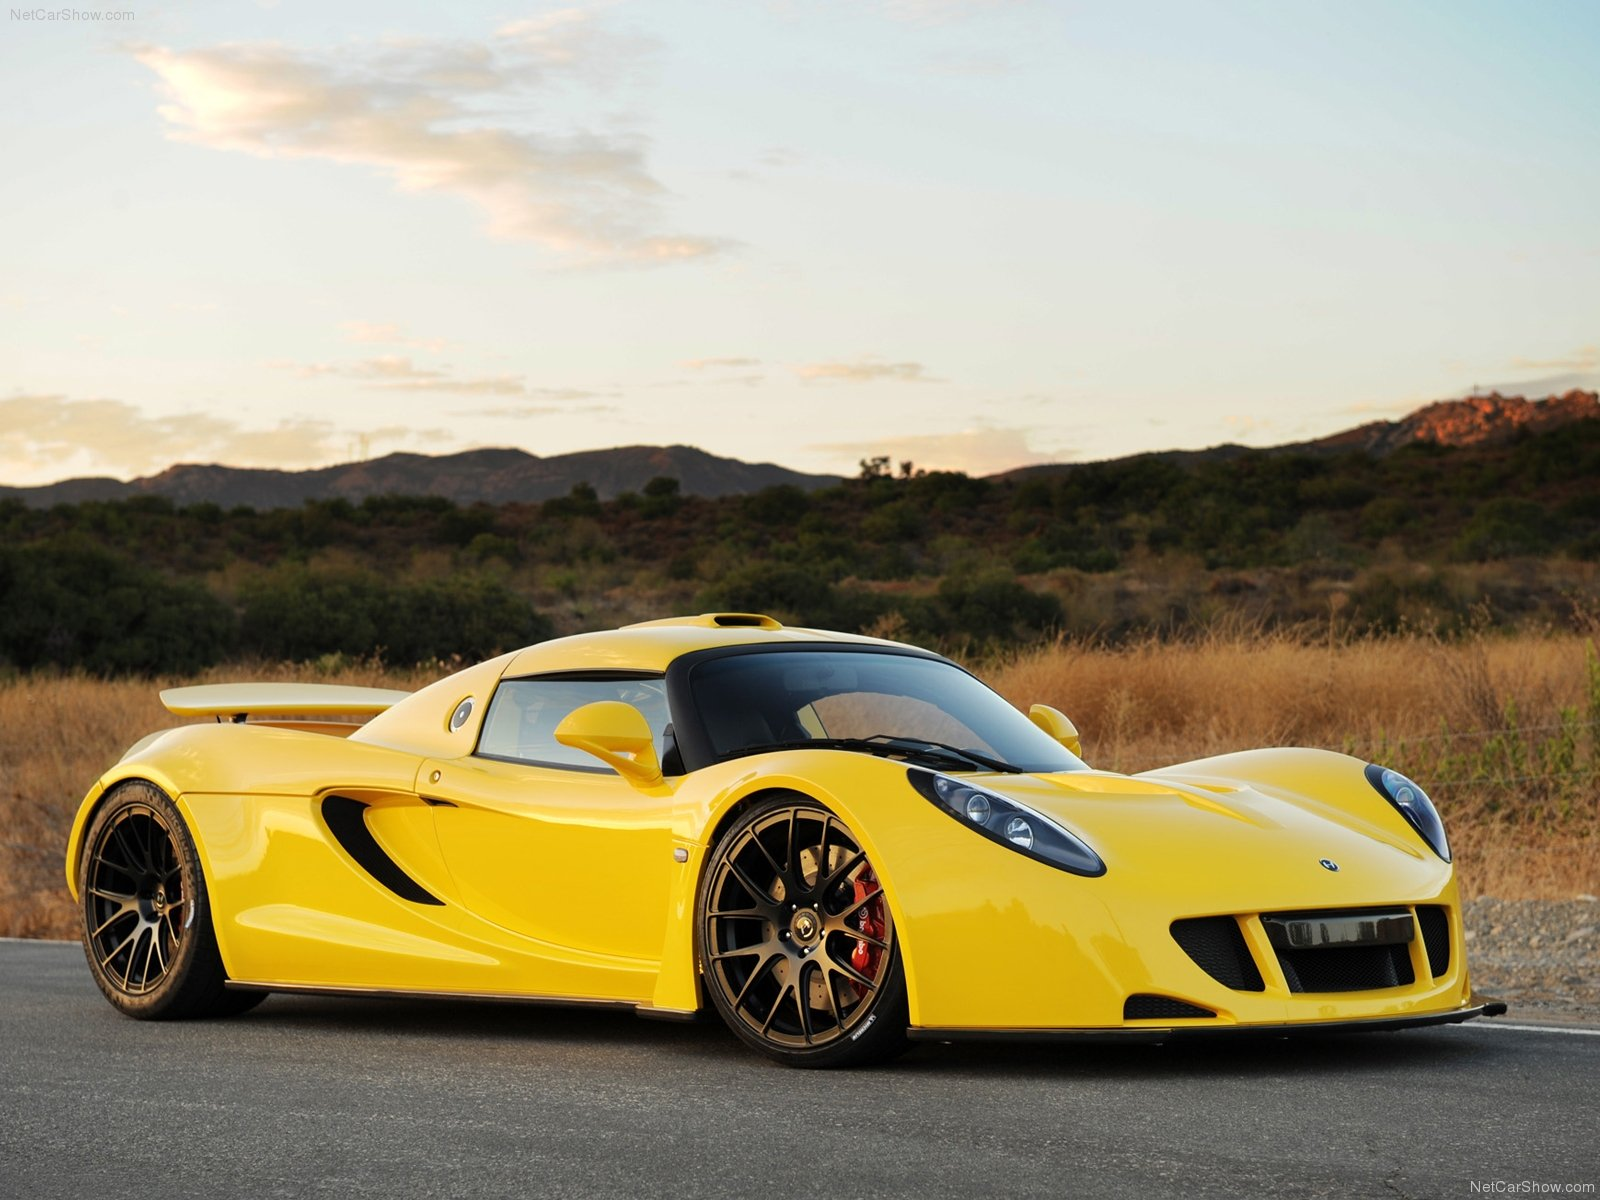 Fastest Production American Car